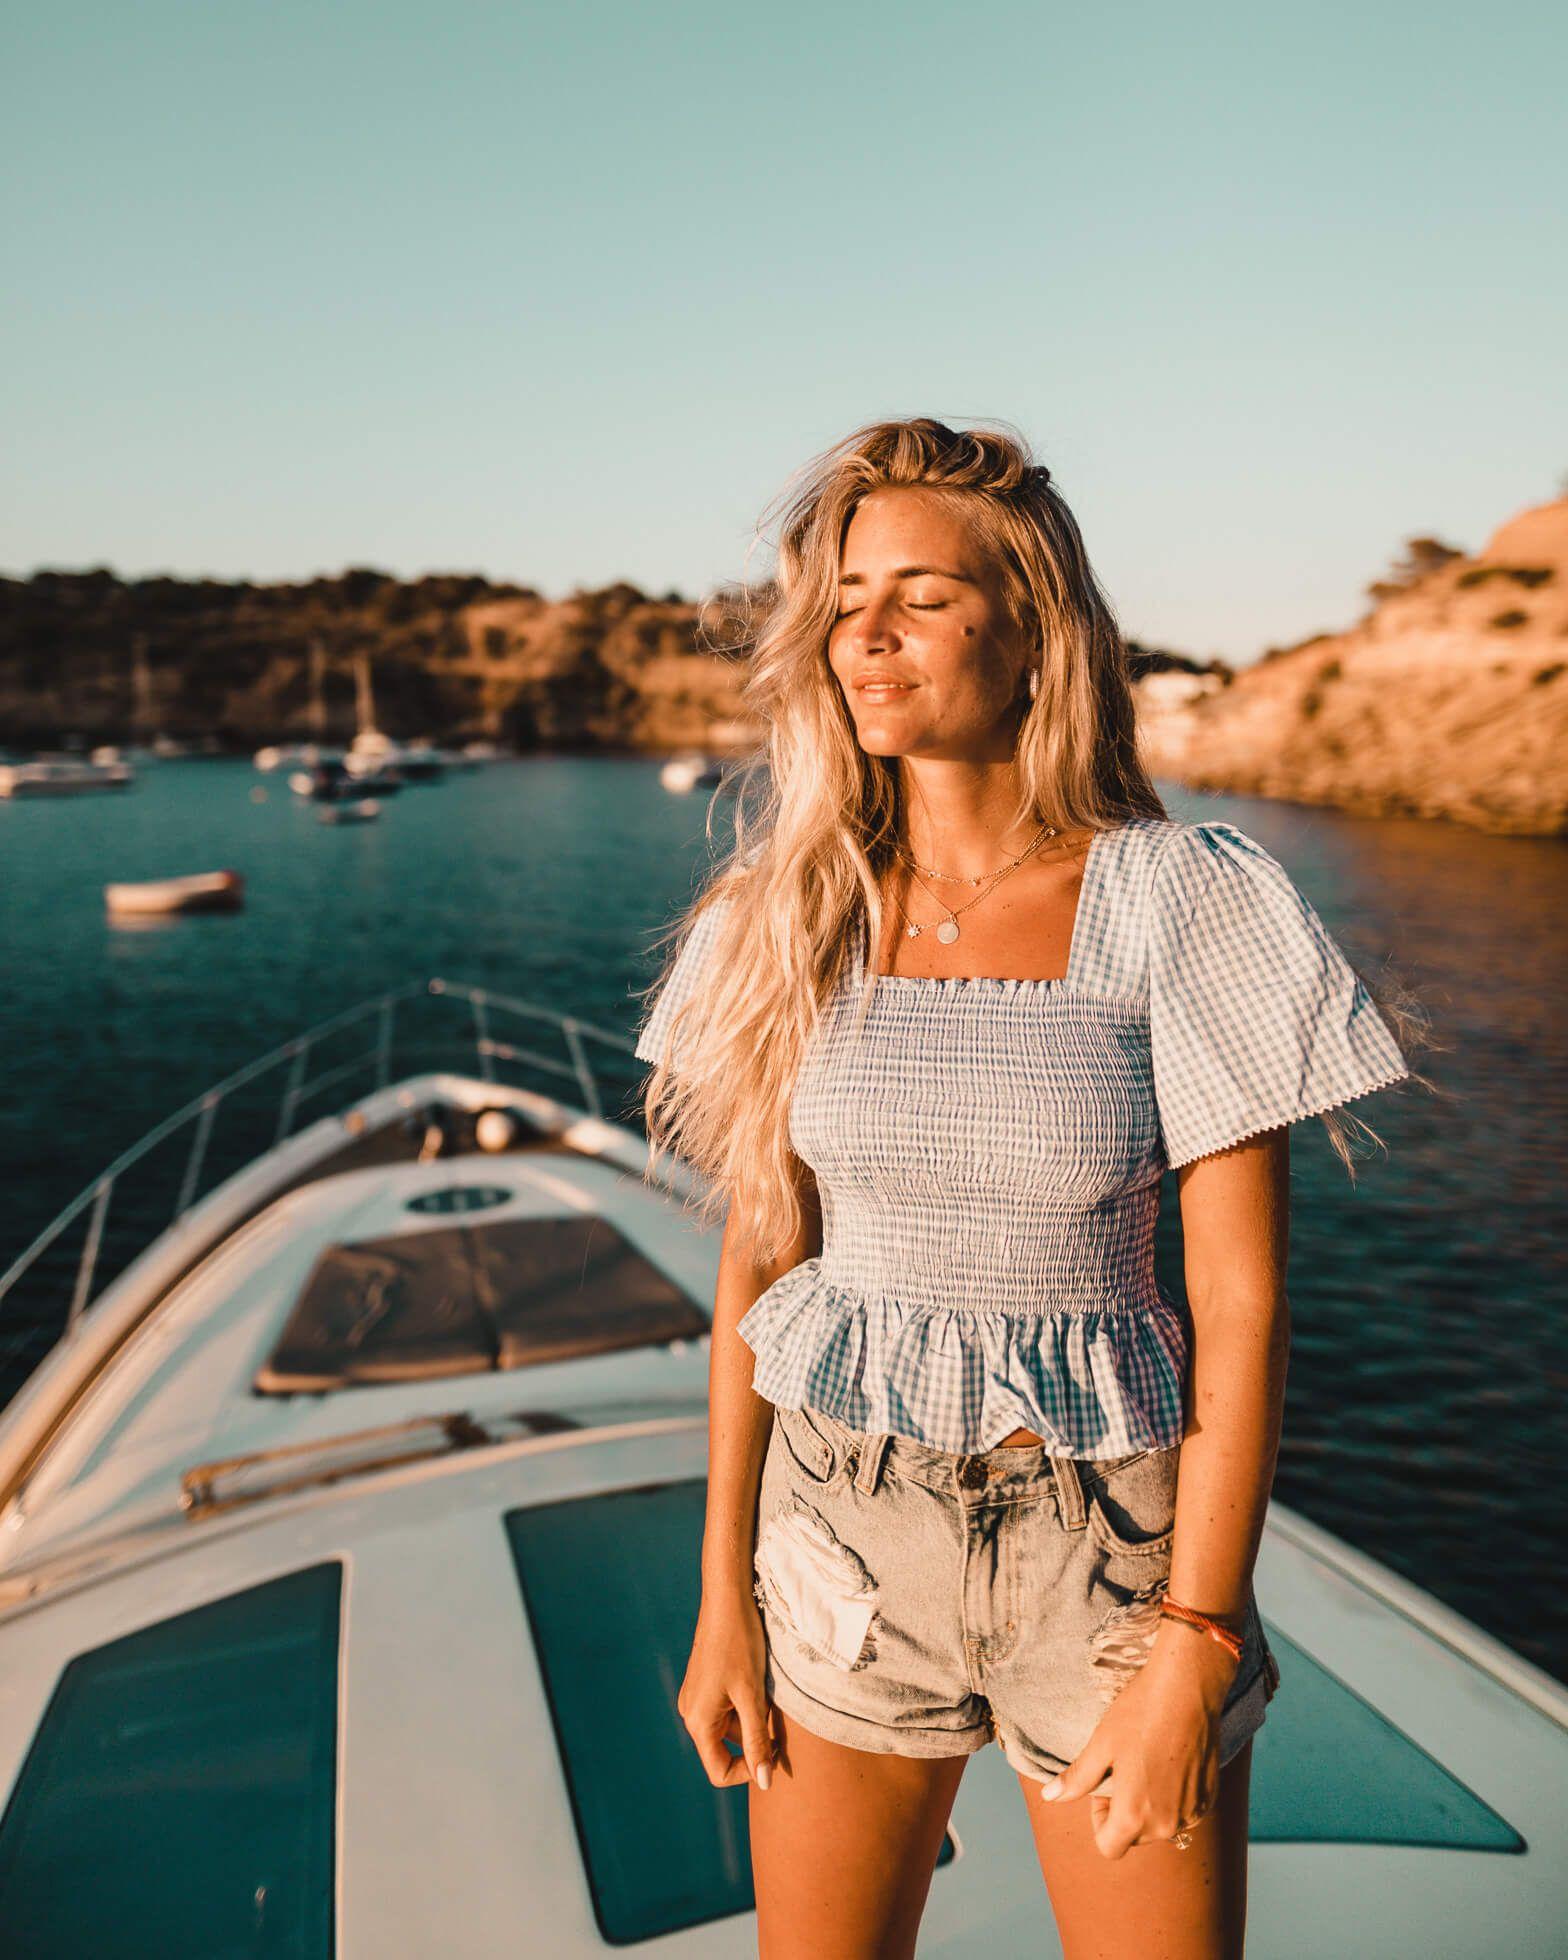 Janni Delér | Kläder, Monaco, Instagram